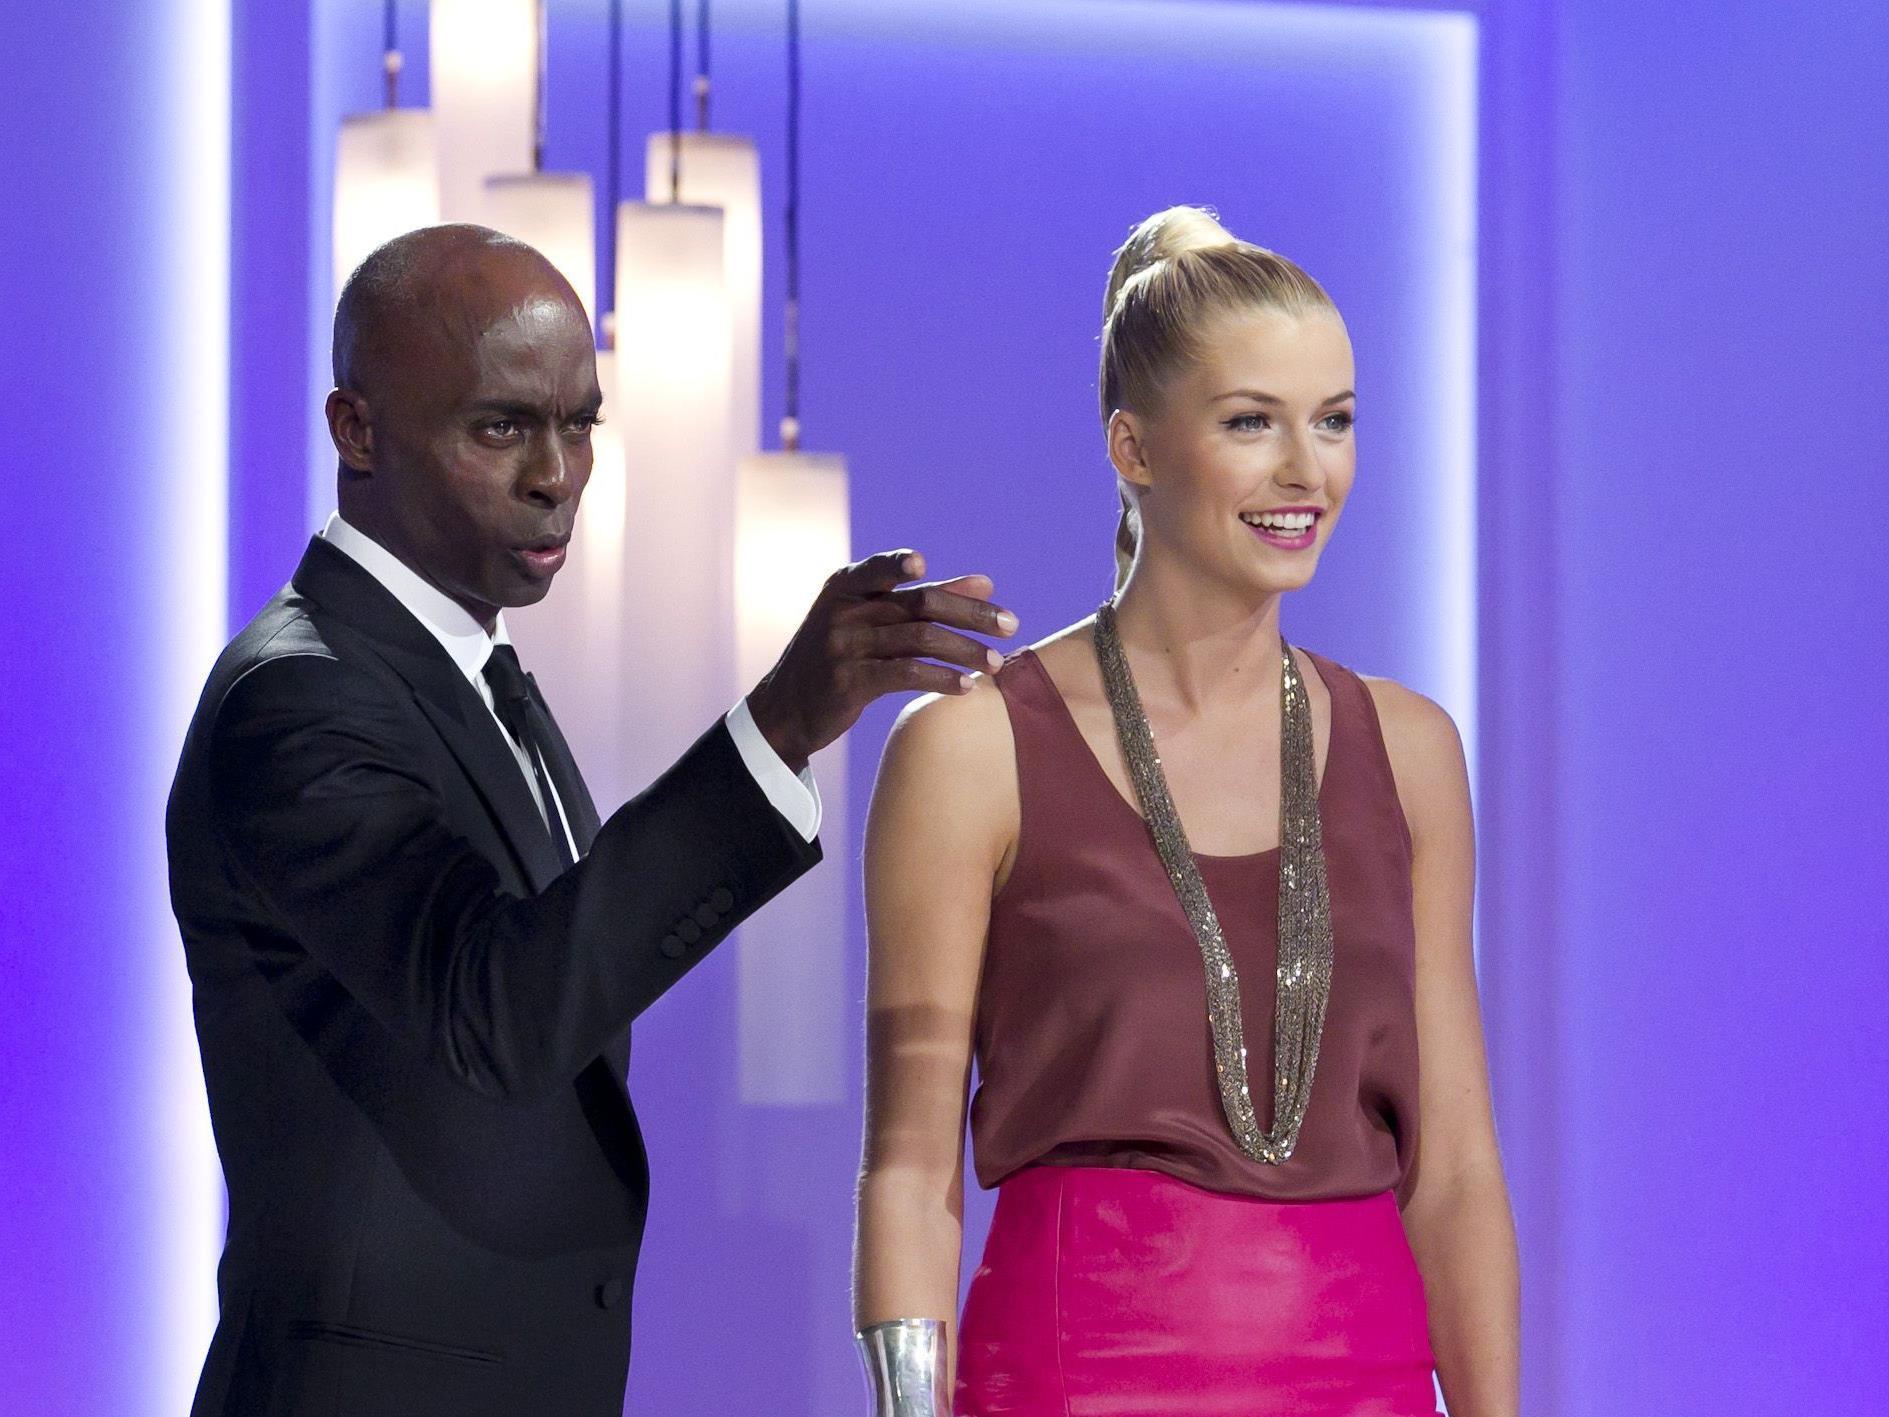 Bruce Darnell Als Juror Bei Austria S Next Topmodel Acom